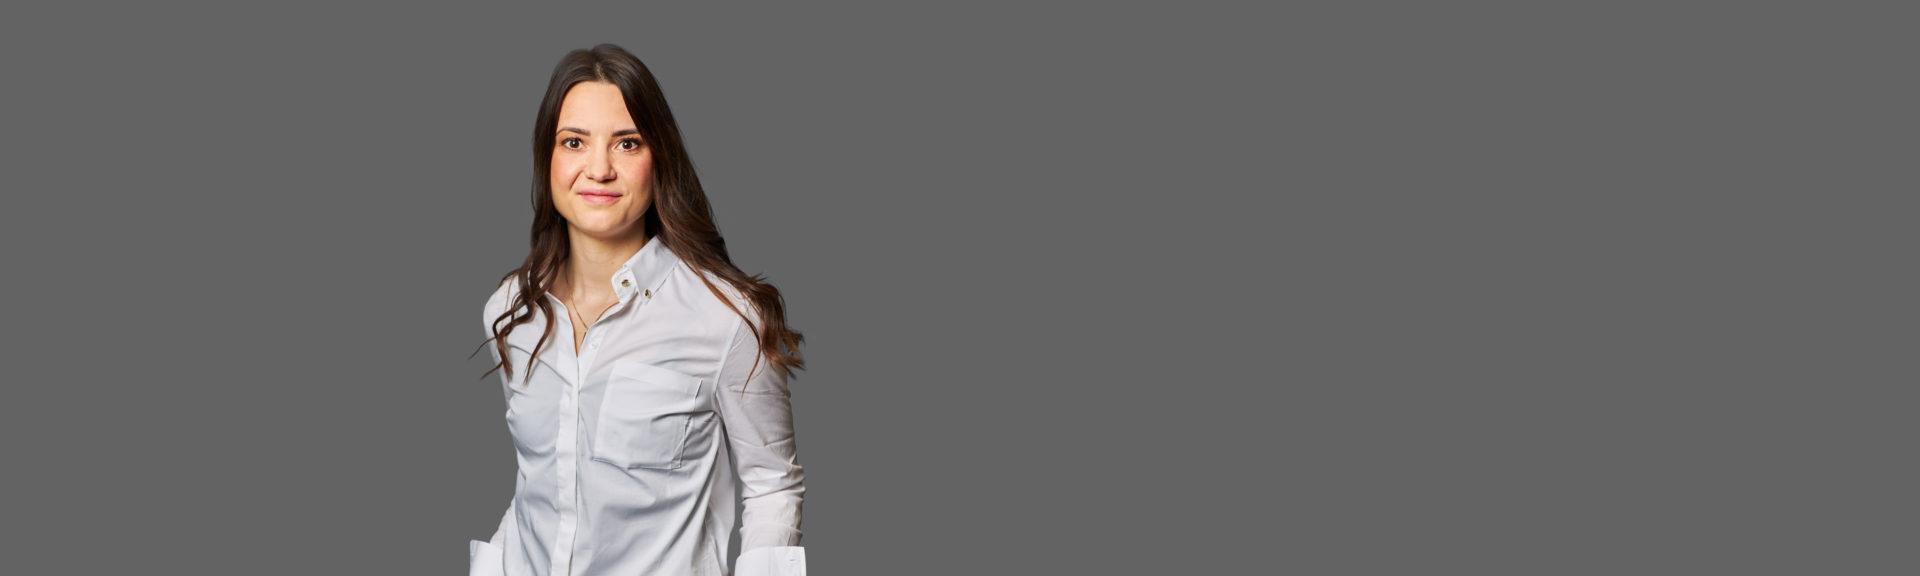 Annelien Schuldink - Dommerholt Advocaten